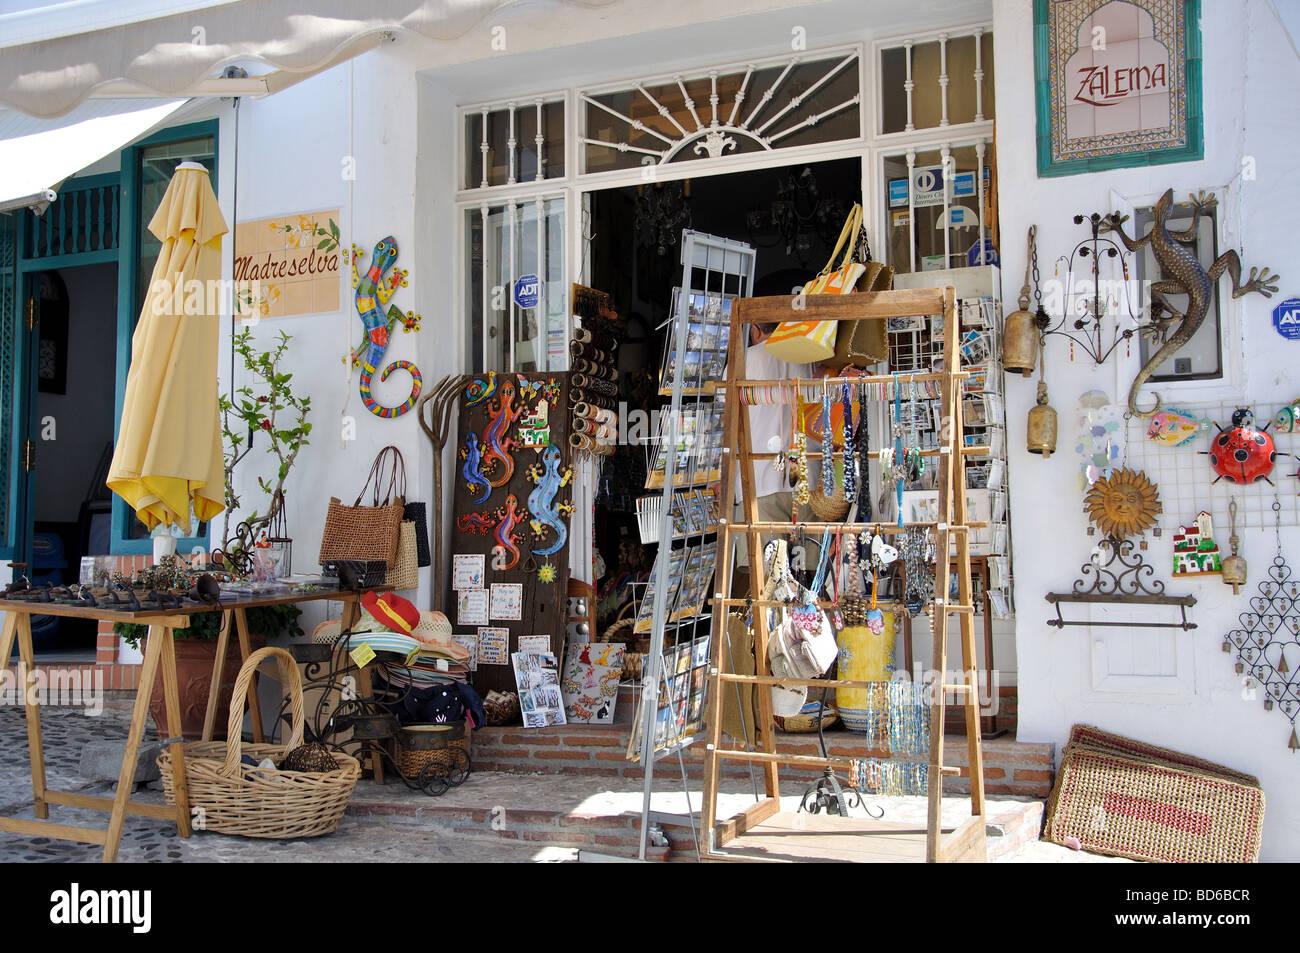 Arts Crafts Shop Frigiliana Costa Del Sol Malaga Province Stock Photo Alamy